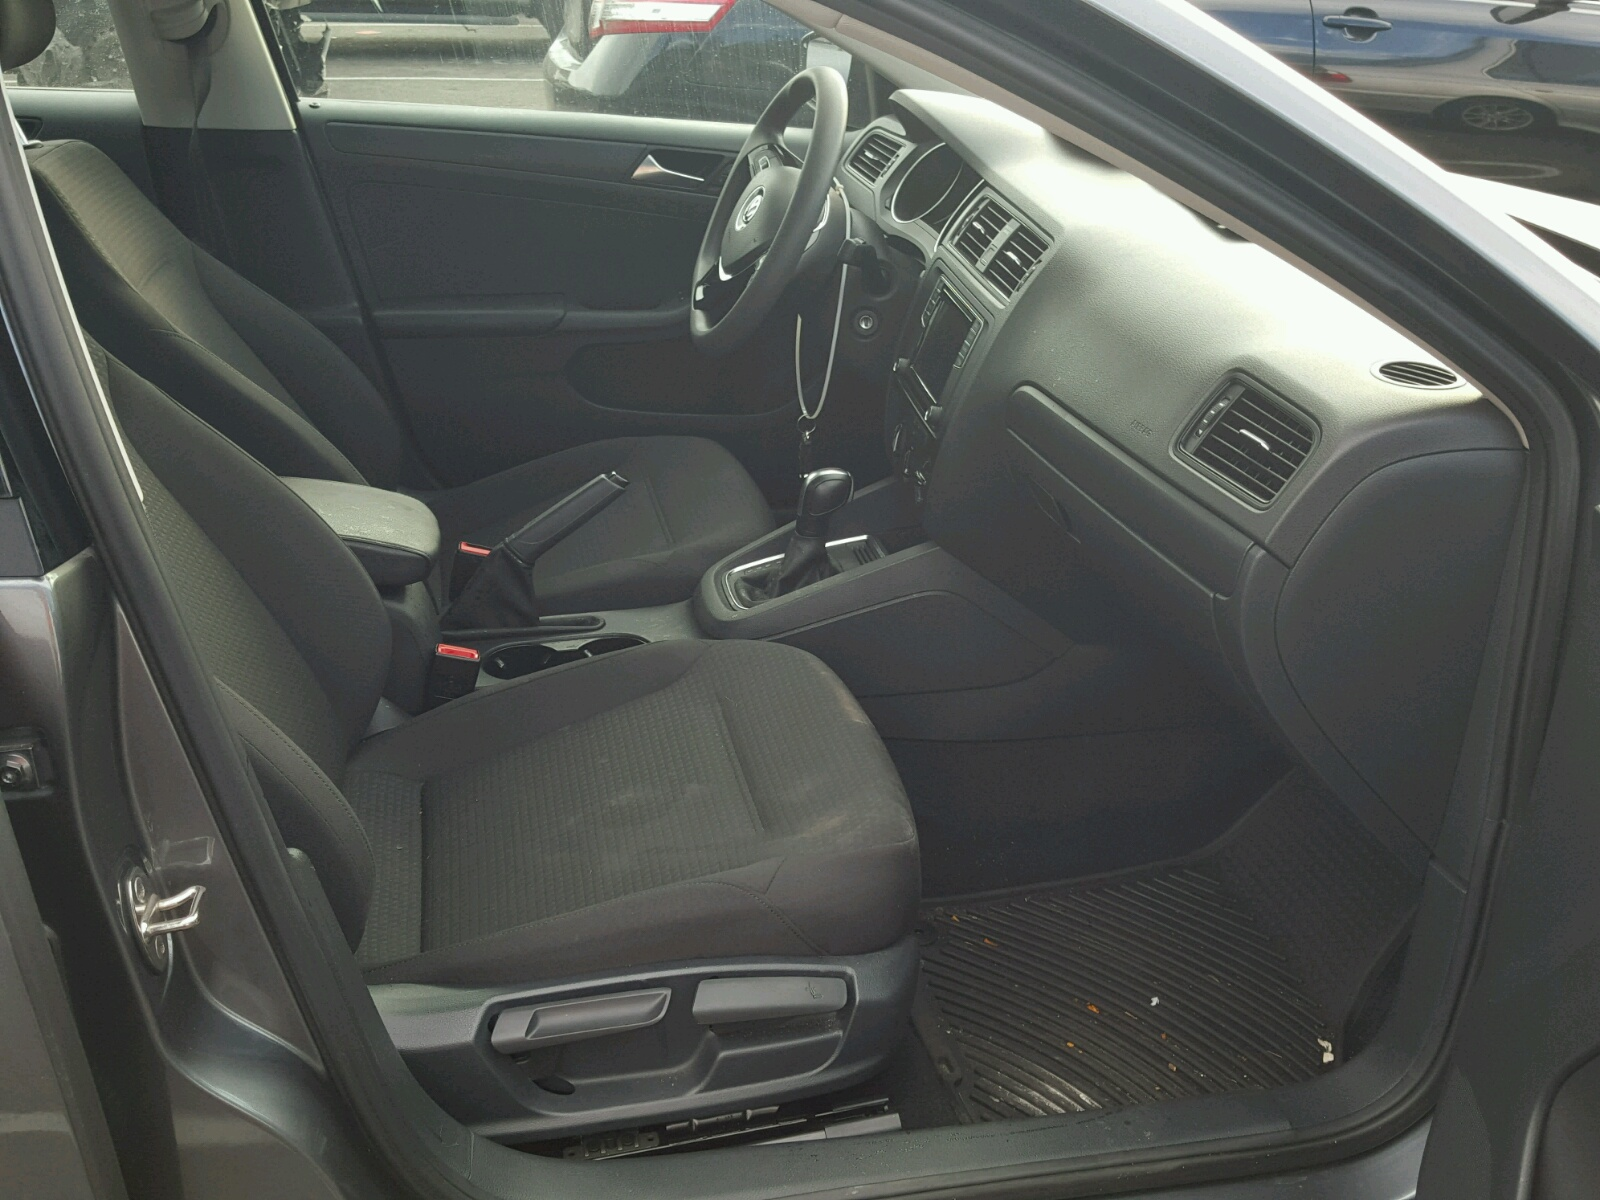 jetta tdi test canada fuel reborn review volkswagen s tsi trendline economy a interior would